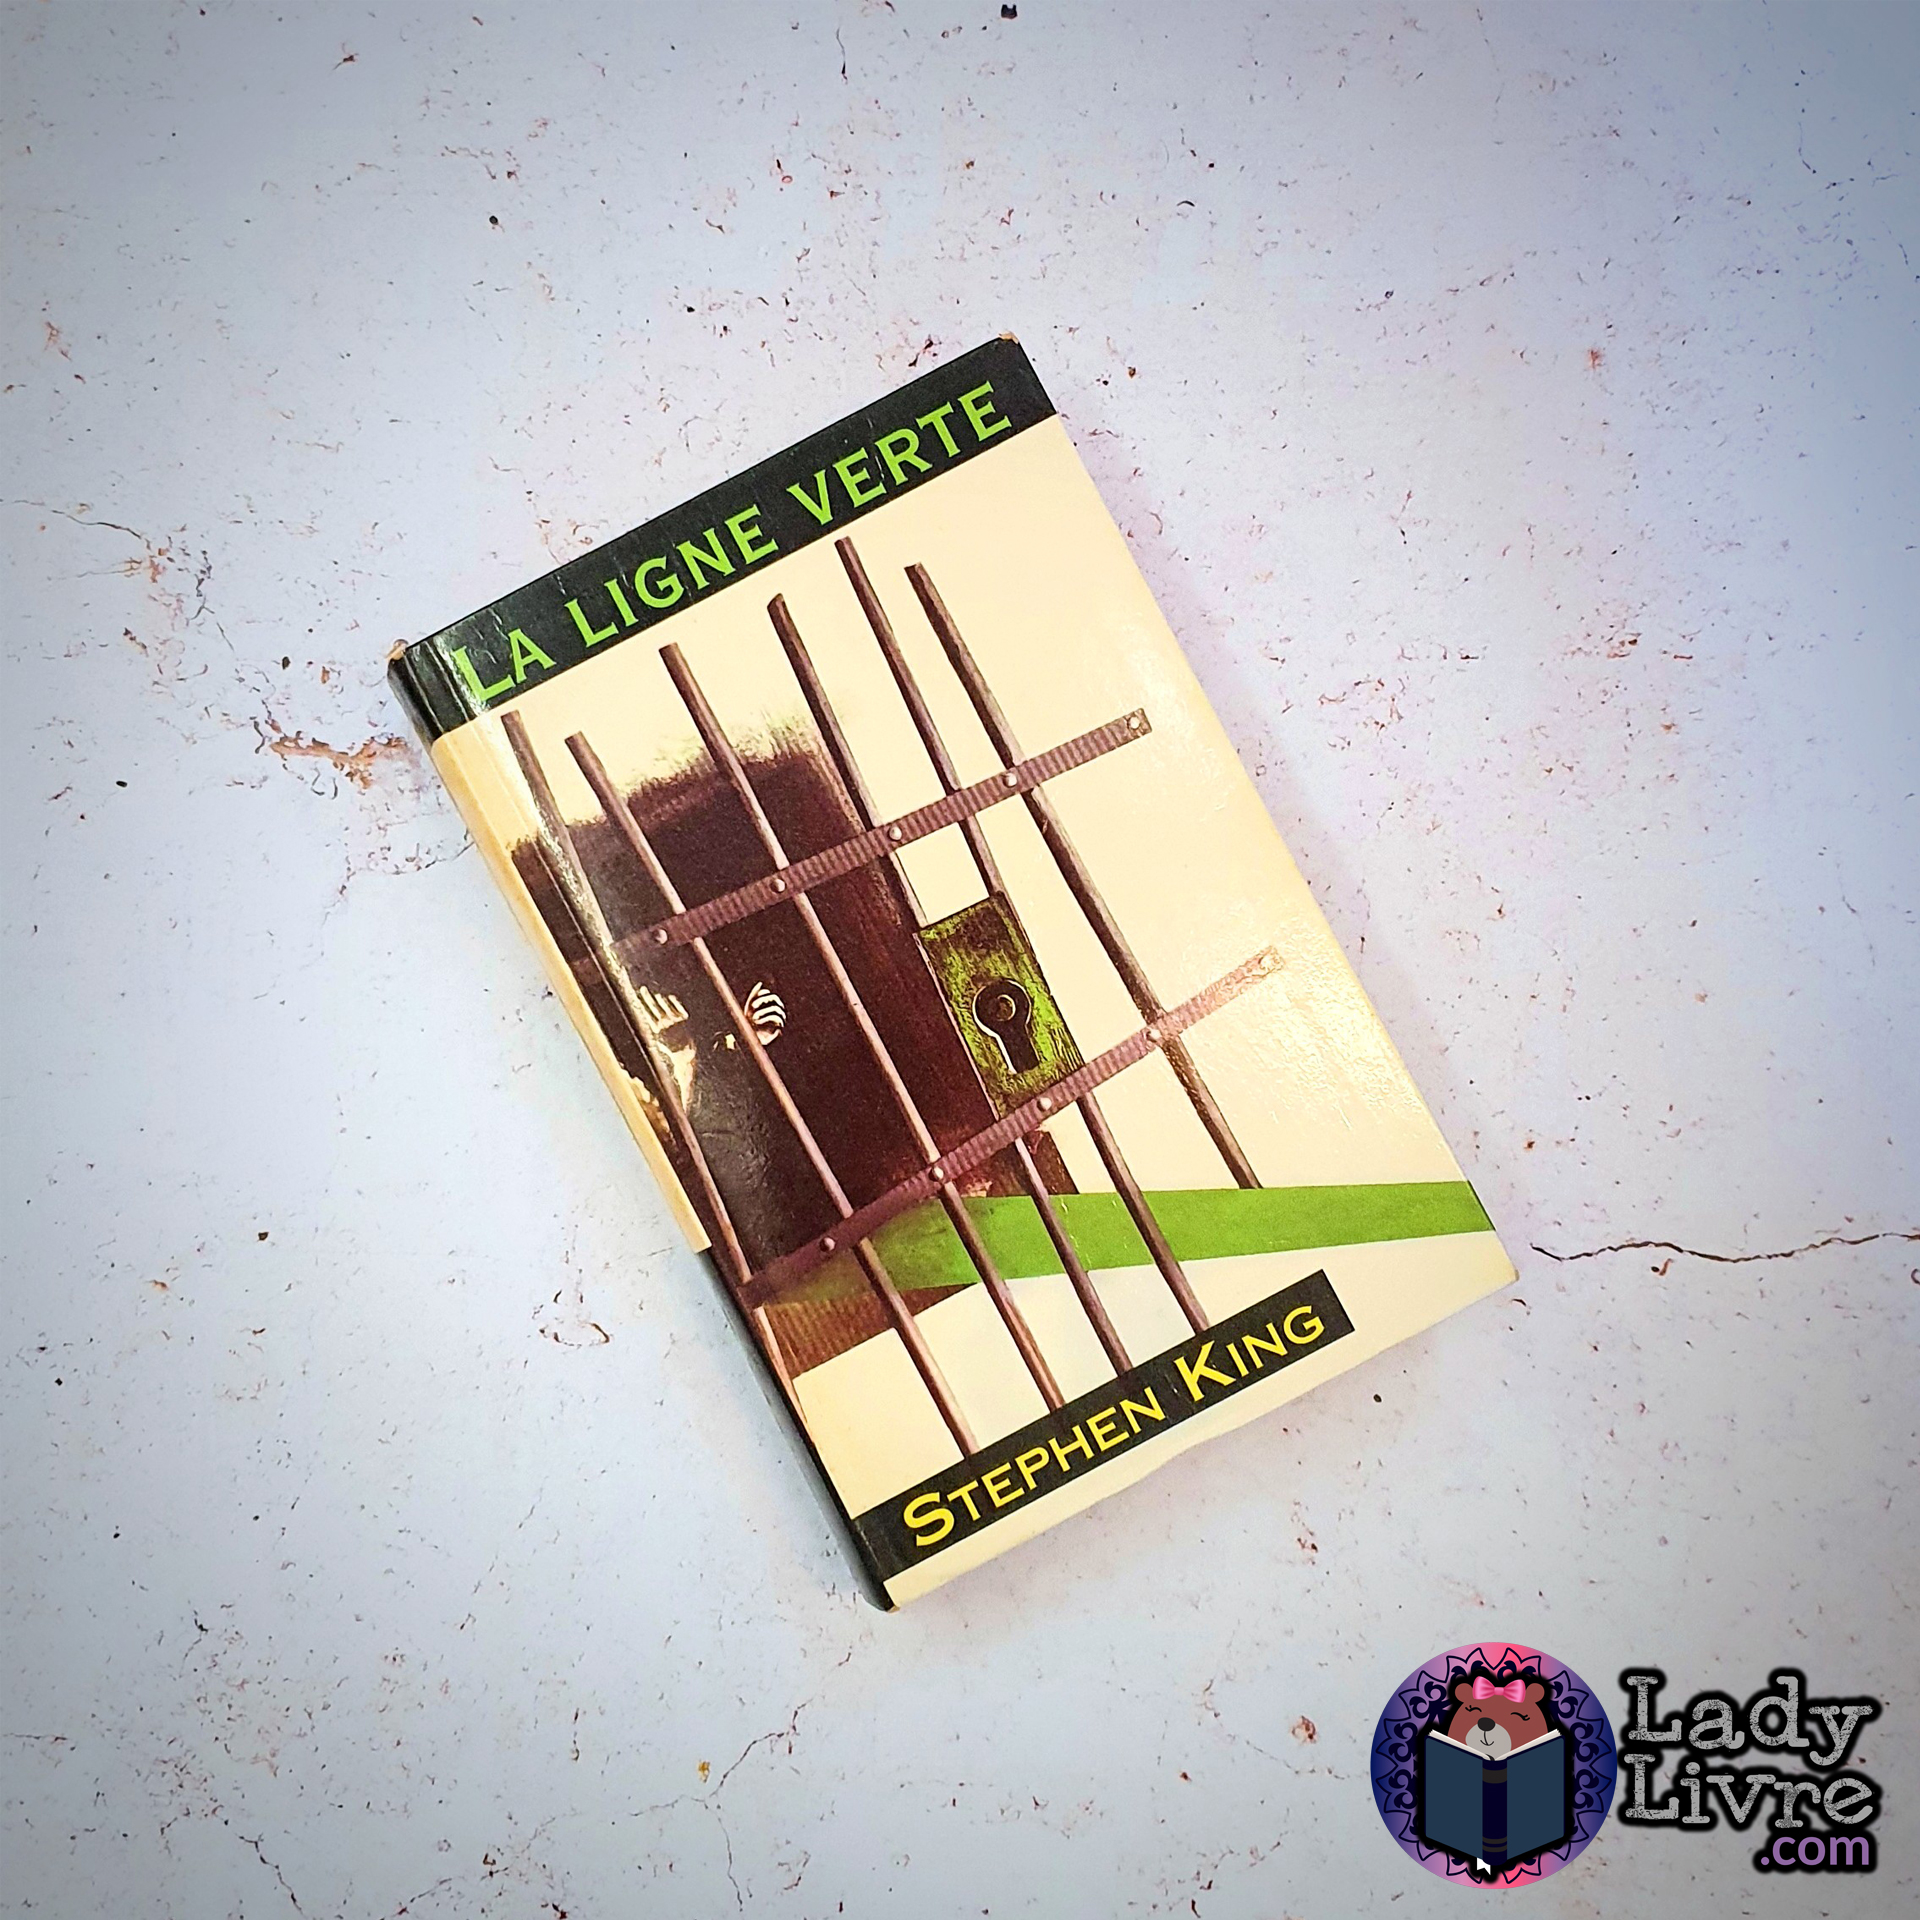 La ligne verte - Stephen King (France Loisirs)